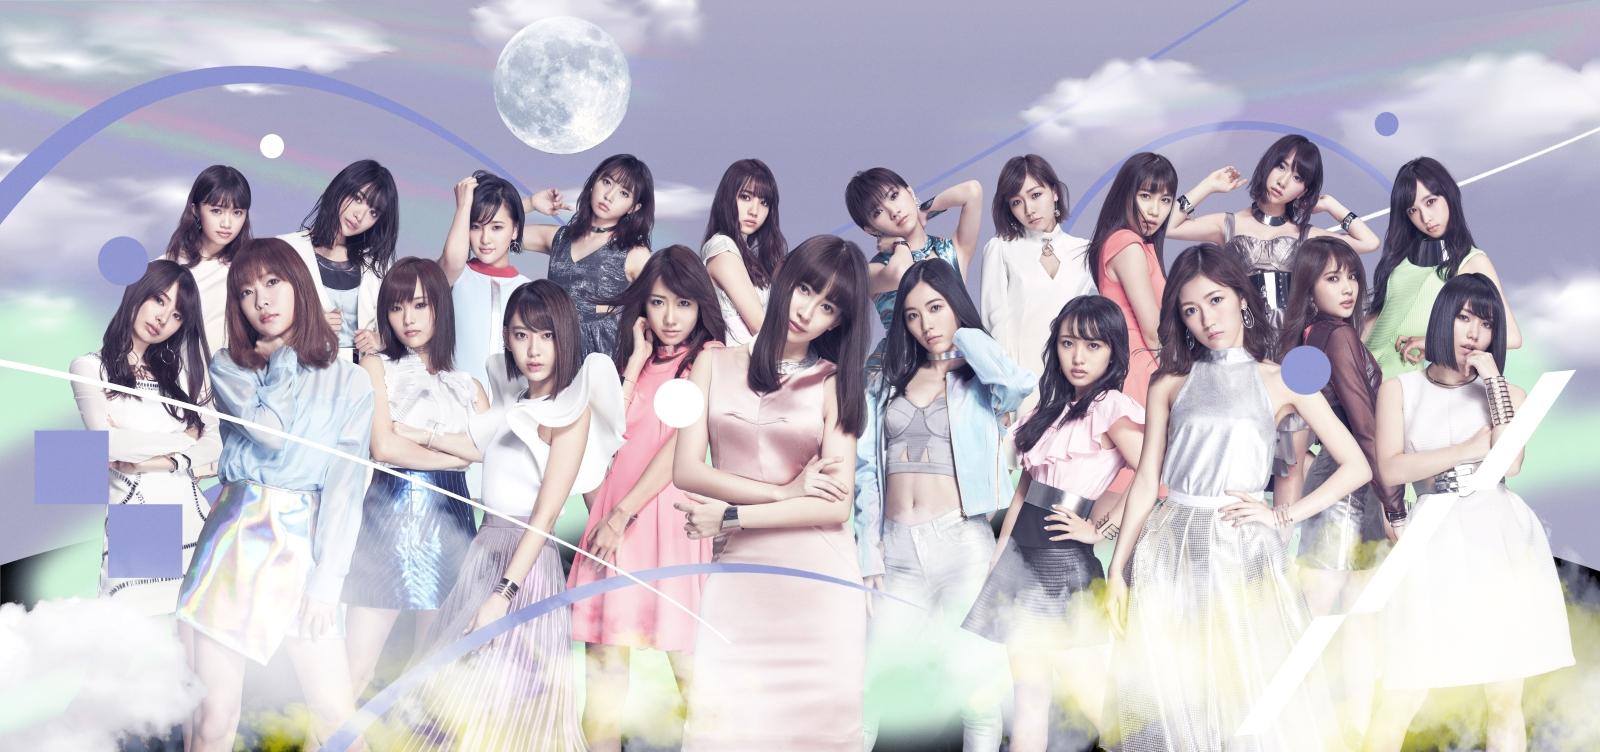 AKB48、小嶋陽菜卒業シングルで「坂道AKB」 乃木坂46&欅坂46とコラボユニット結成